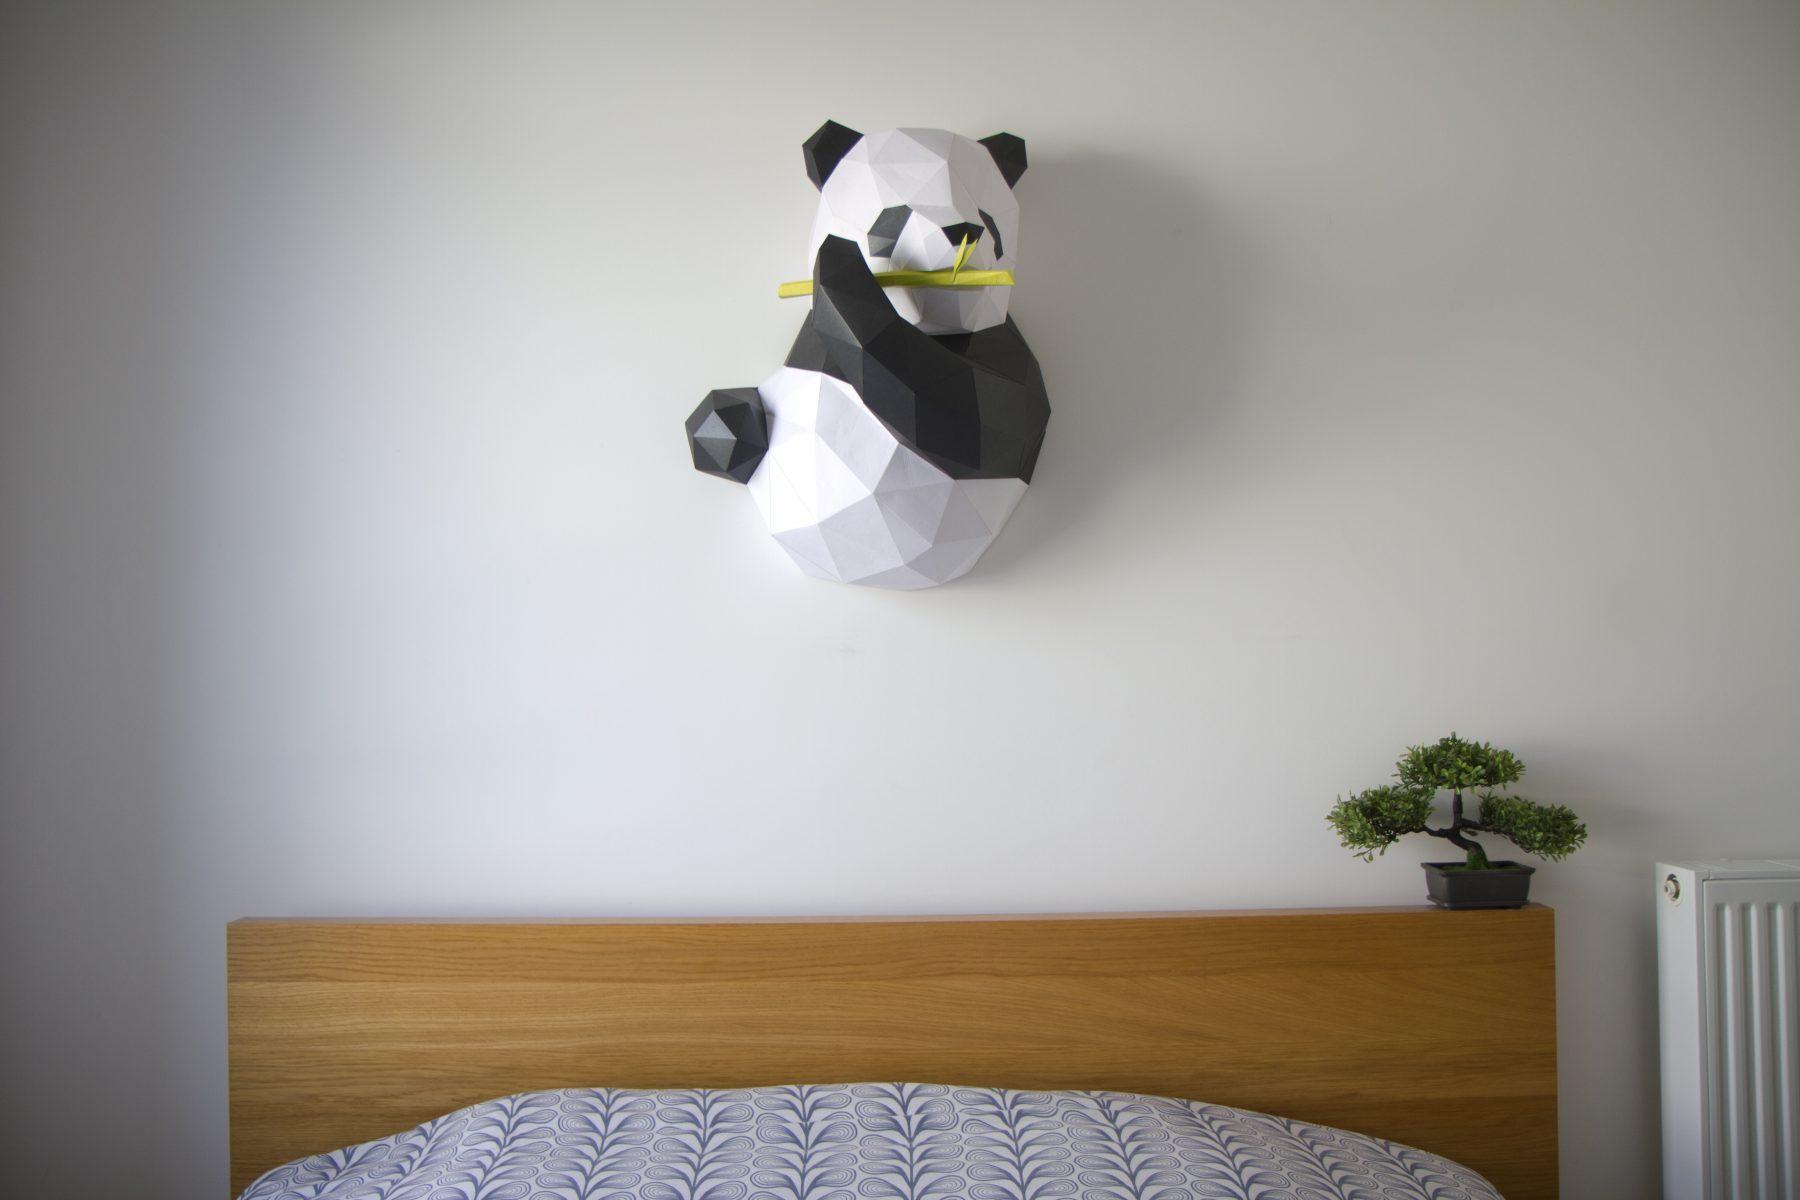 Paper Papier Chengdu Panda Origami low poly